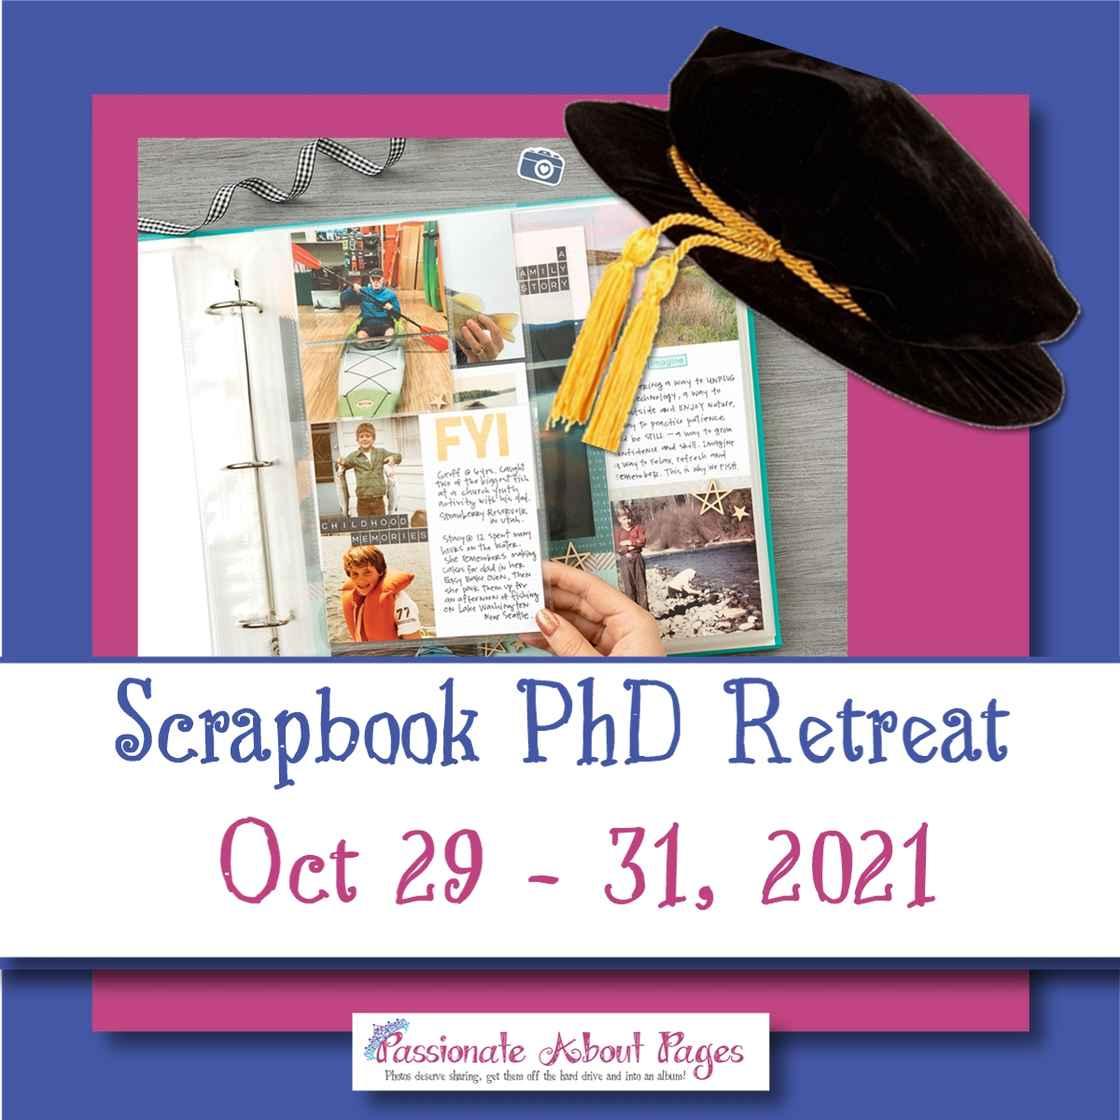 PhD Retreat - Page 002